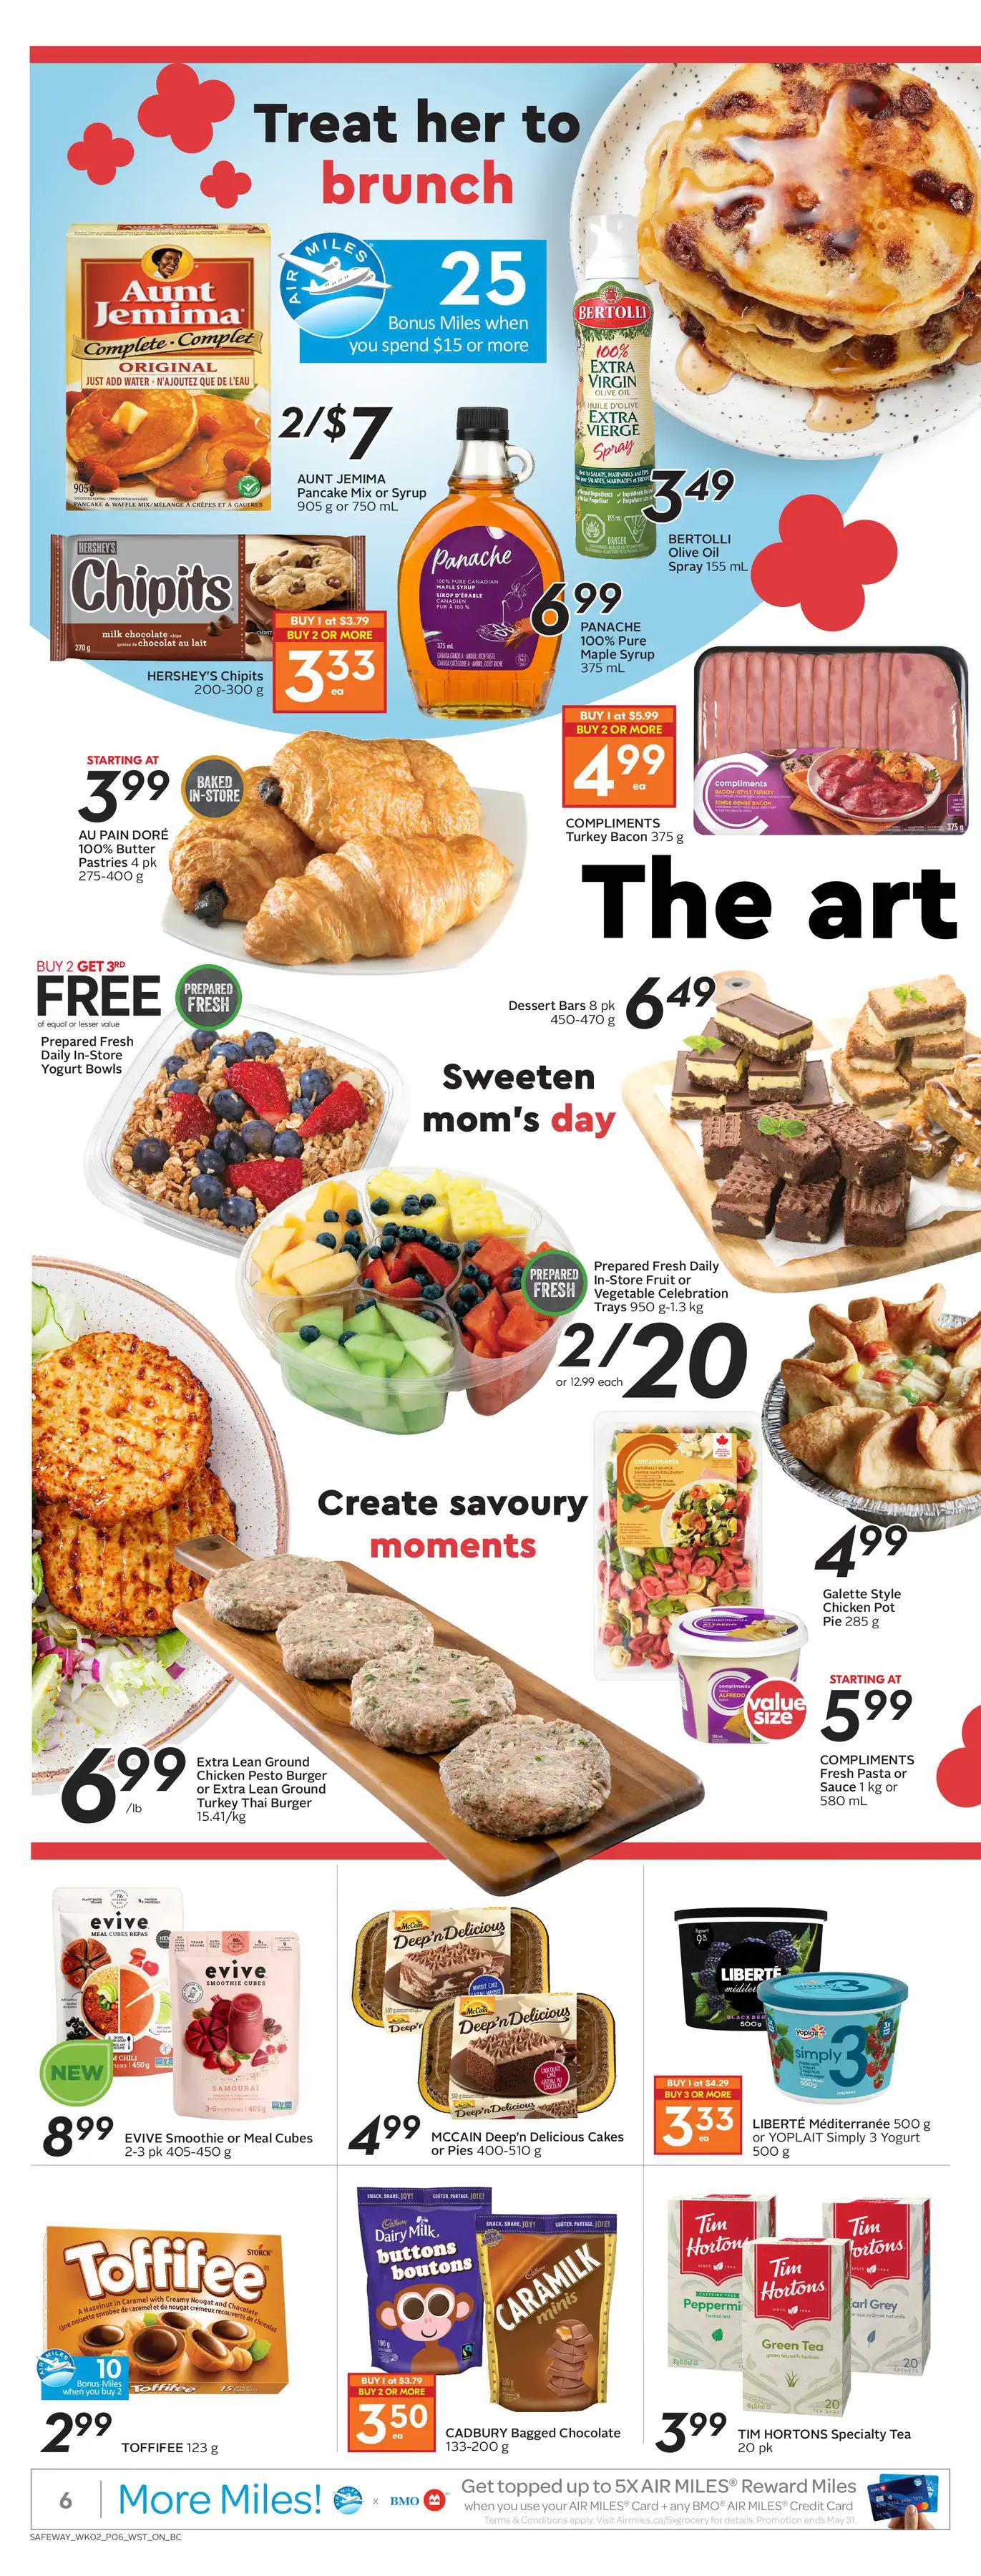 Safeway - Weekly Flyer Specials - Page 7